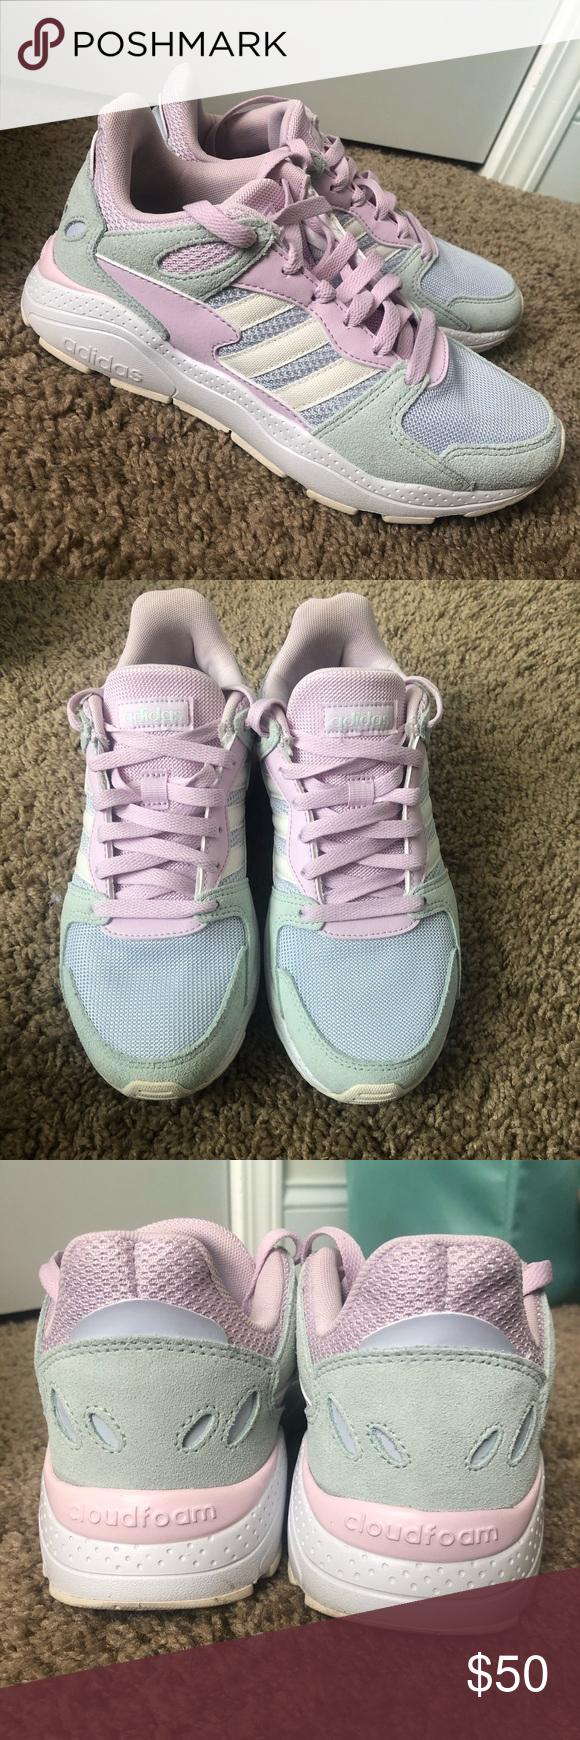 adidas ortholite shoes price